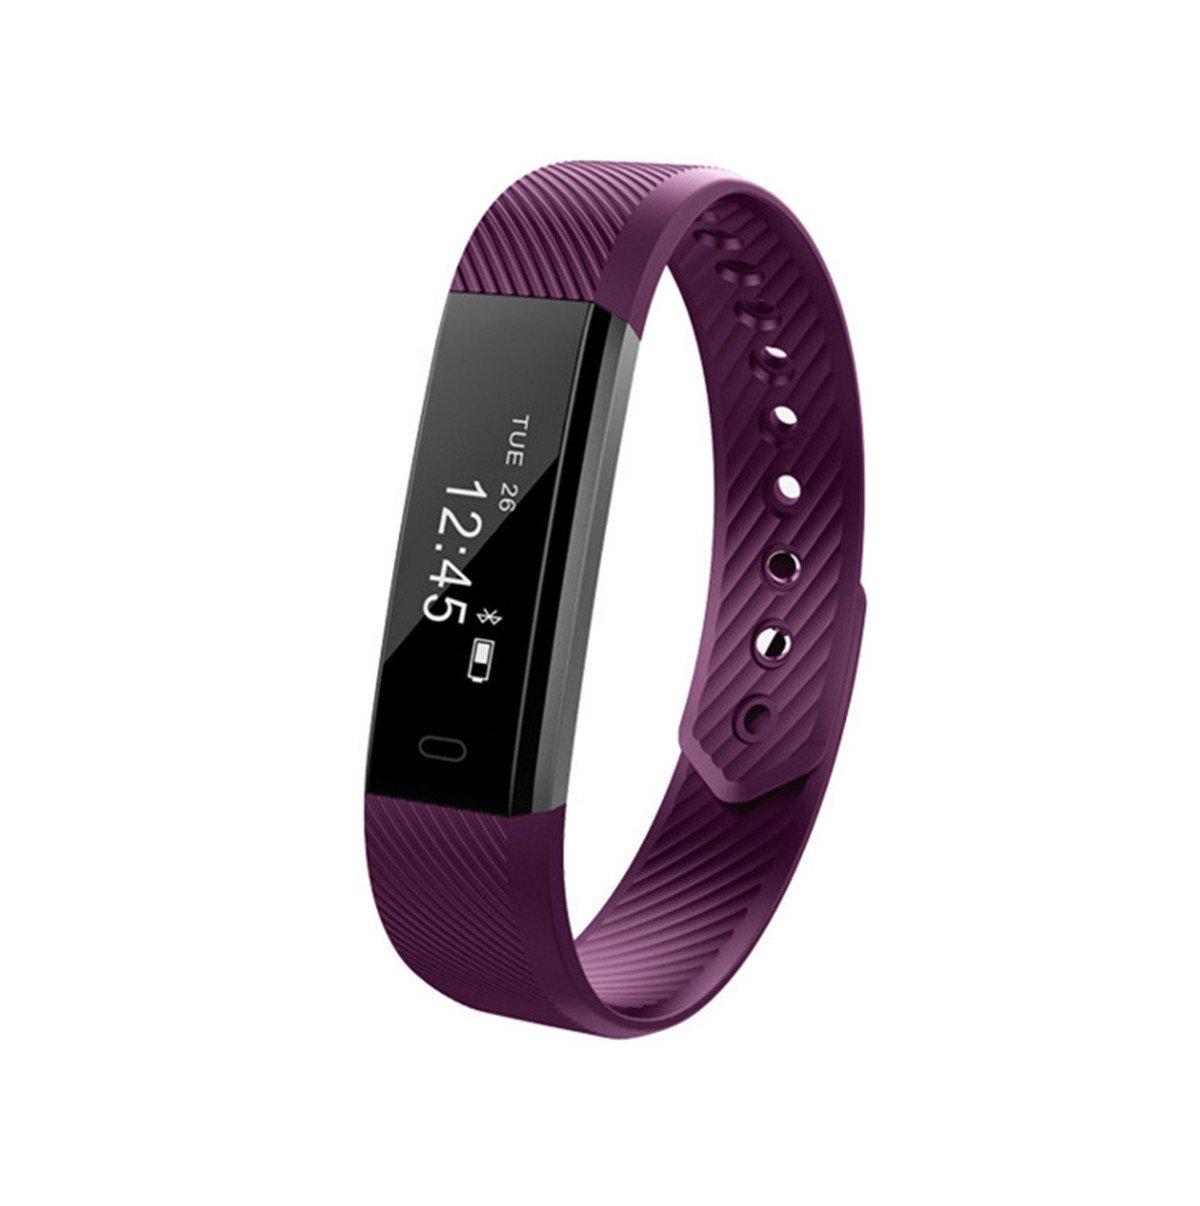 JLH Smart Bracelet Smart Watch Heart rate monitoring Motion detection fitness tracker Multi-functional high-techs (purple)